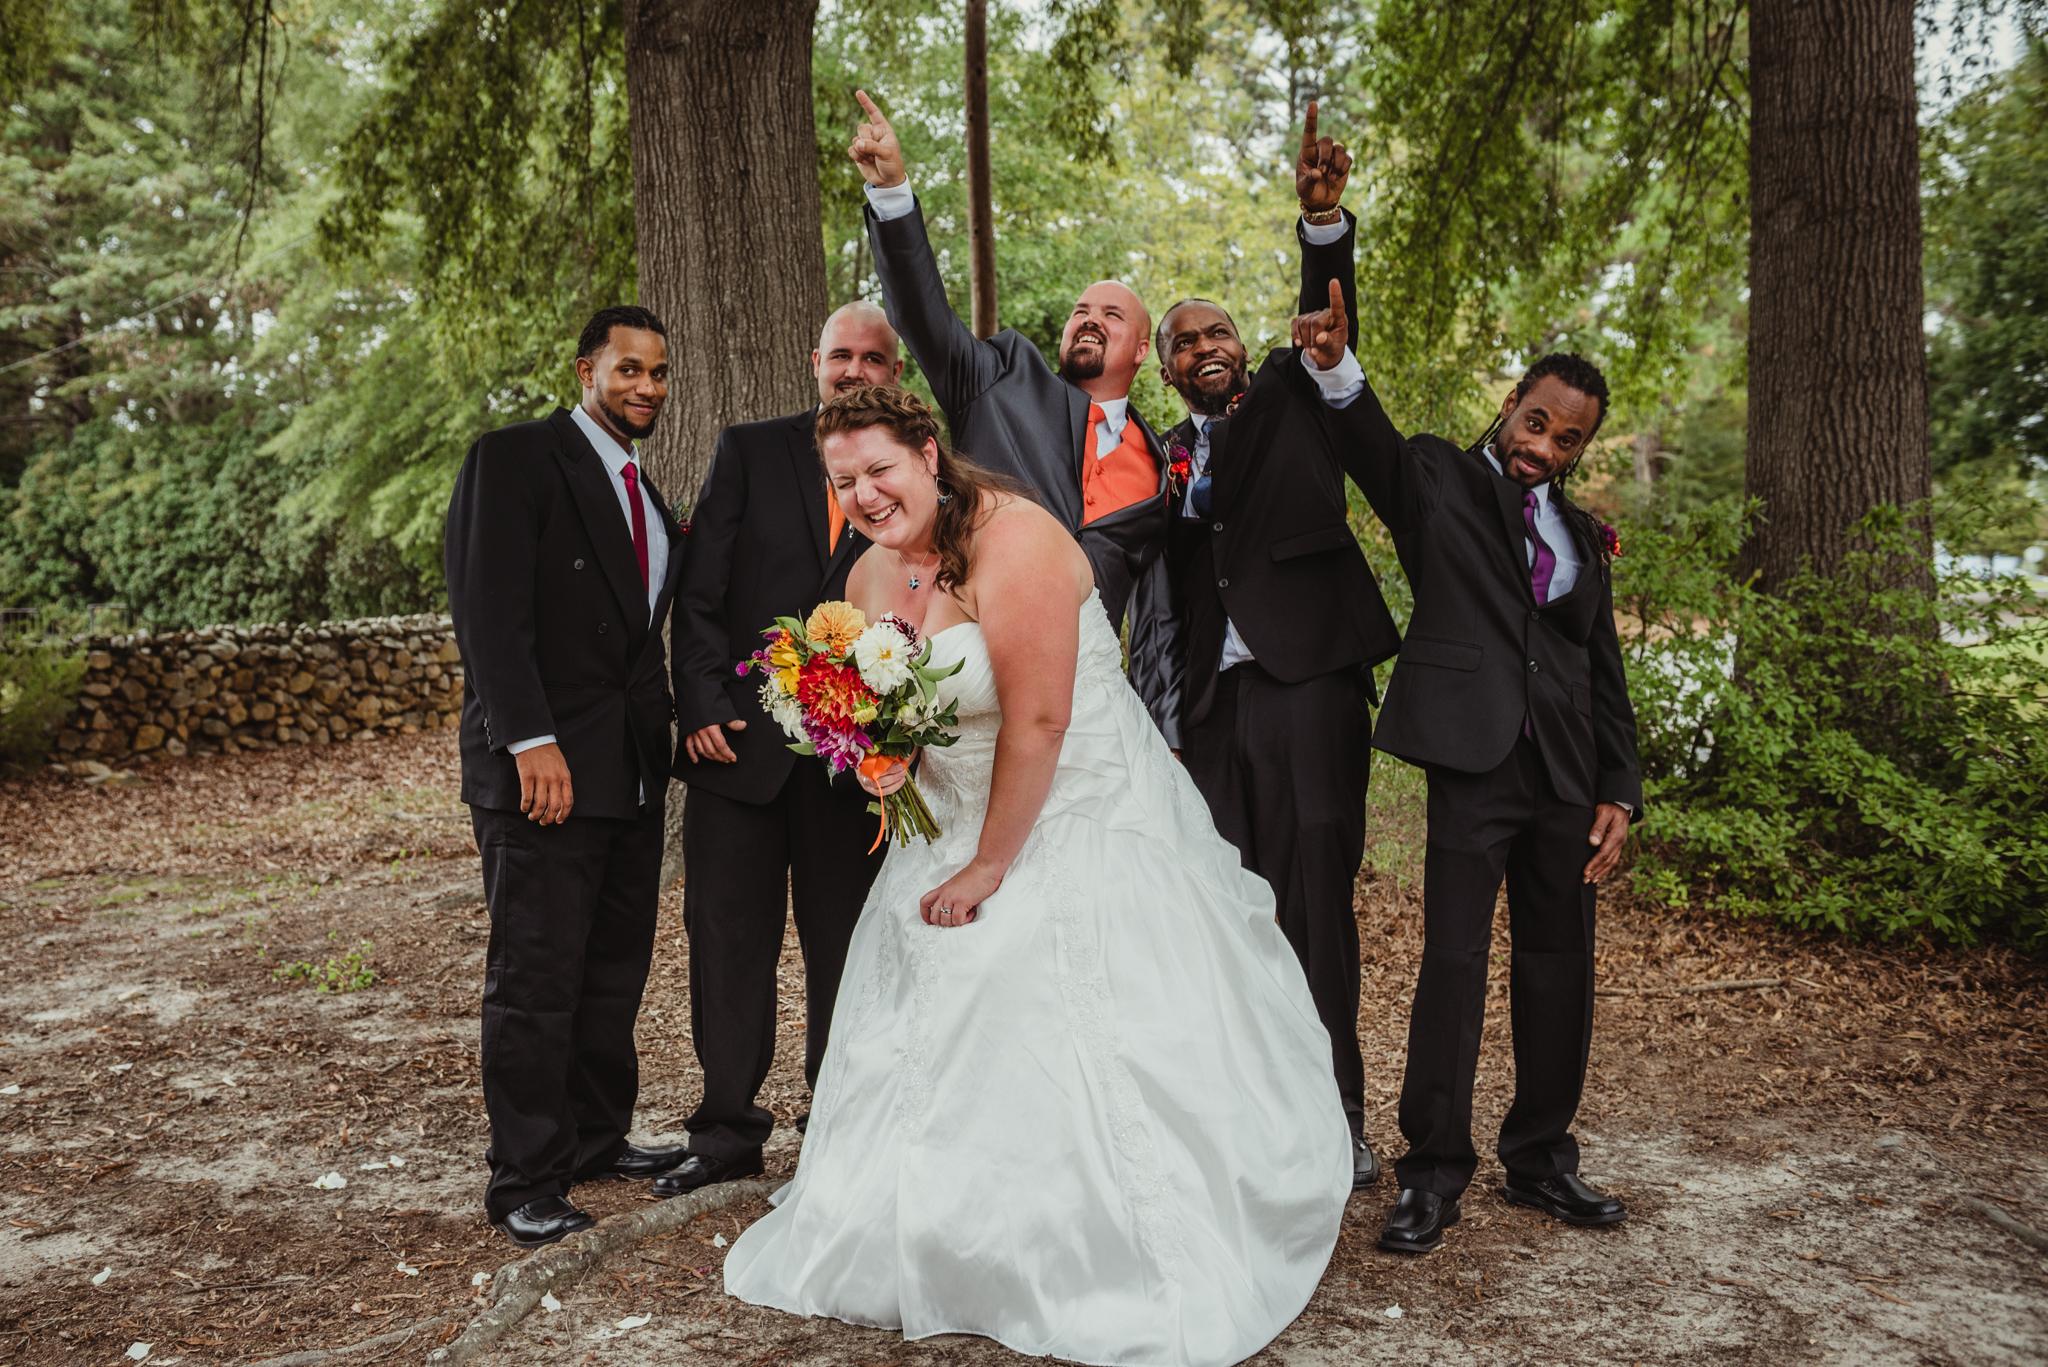 raleigh-wedding-groomsmen-portraits-cd-2.jpg